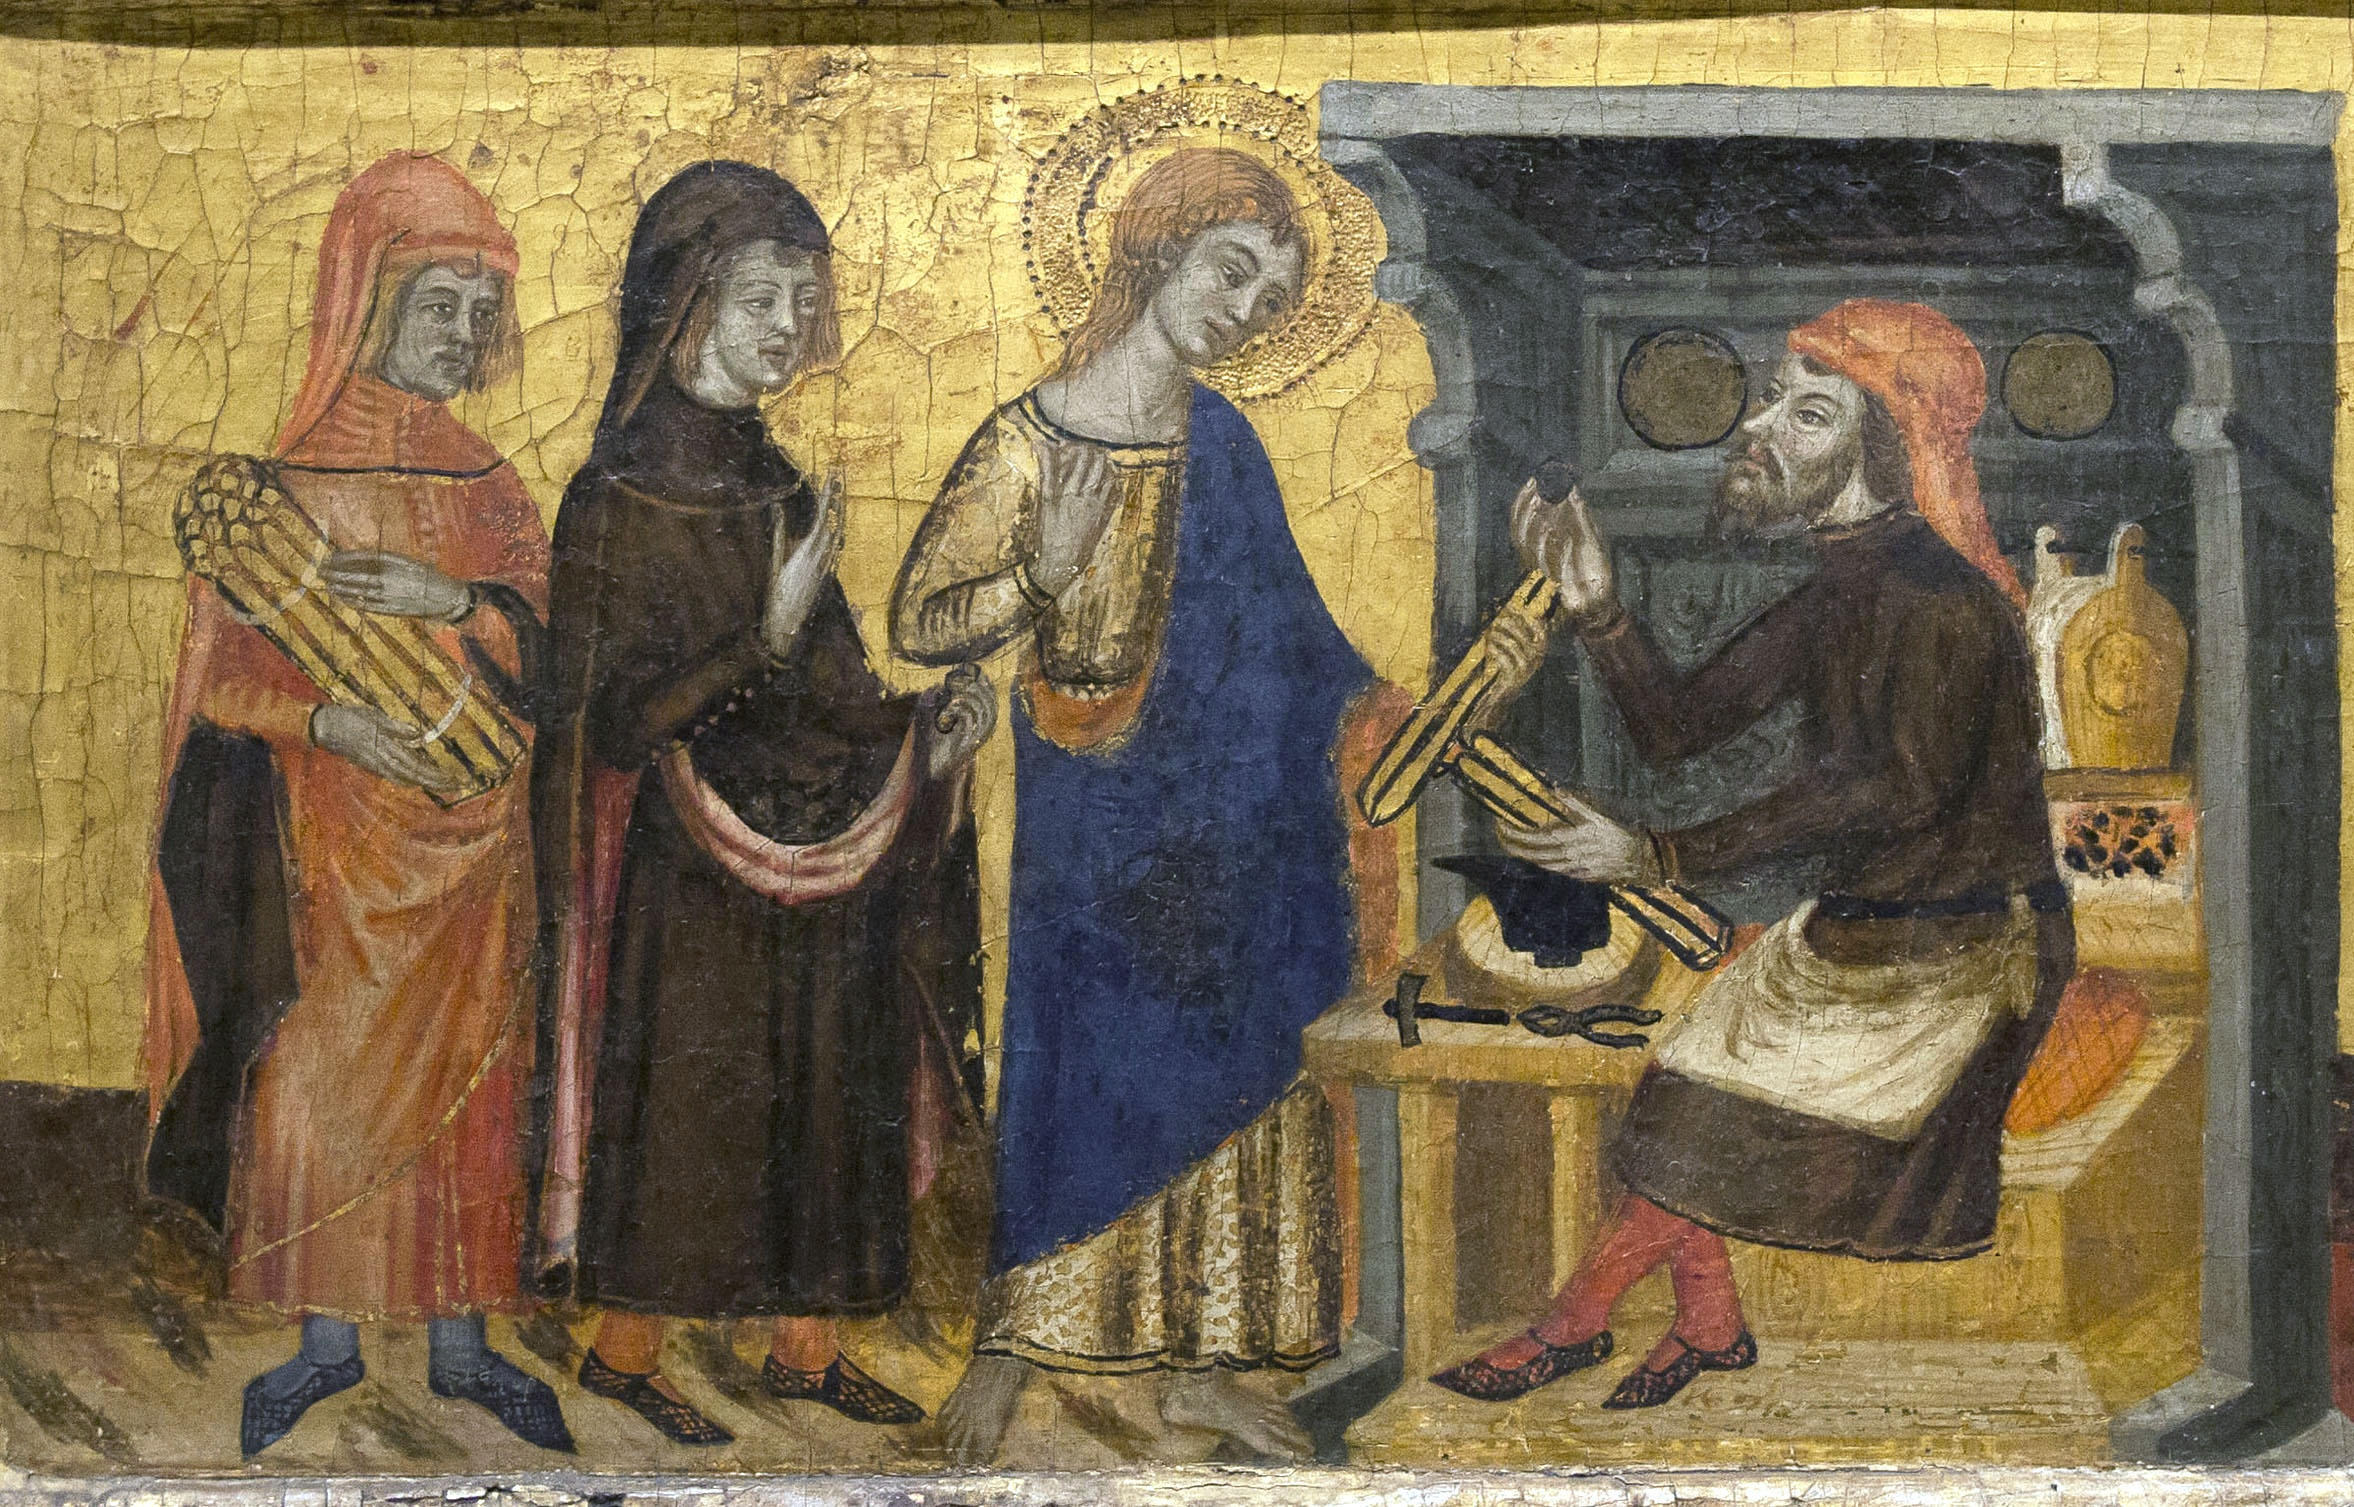 Altarpiece of the Saints John